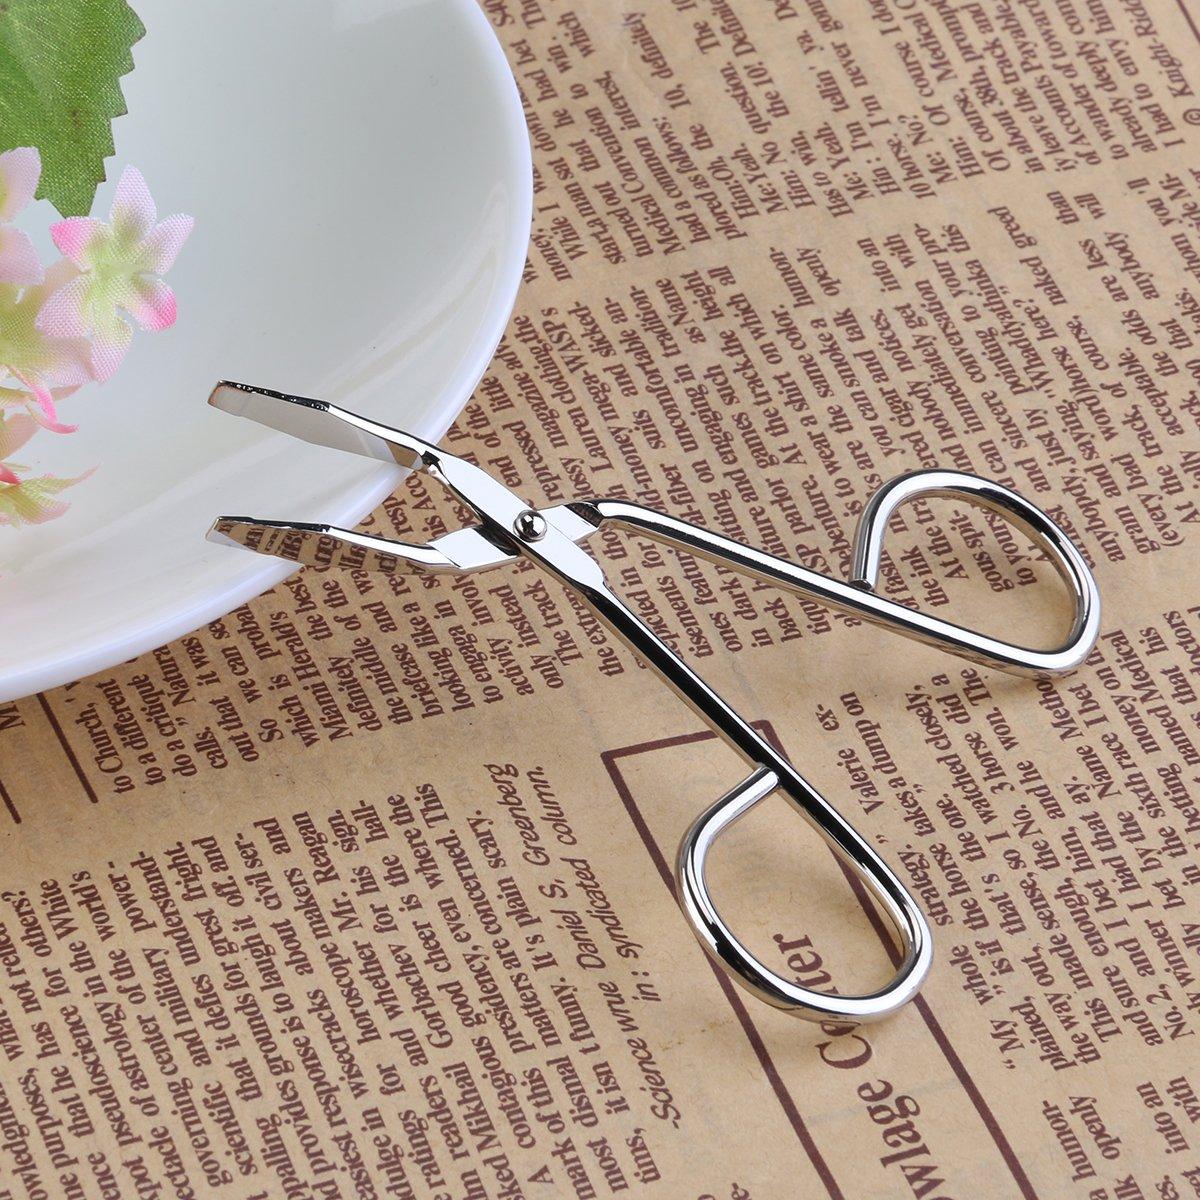 Stainless Steel Eyebrow Tweezer, Facial Hair Tweezer Nose Hair Trimmer Eyebrow Clip (Silver)